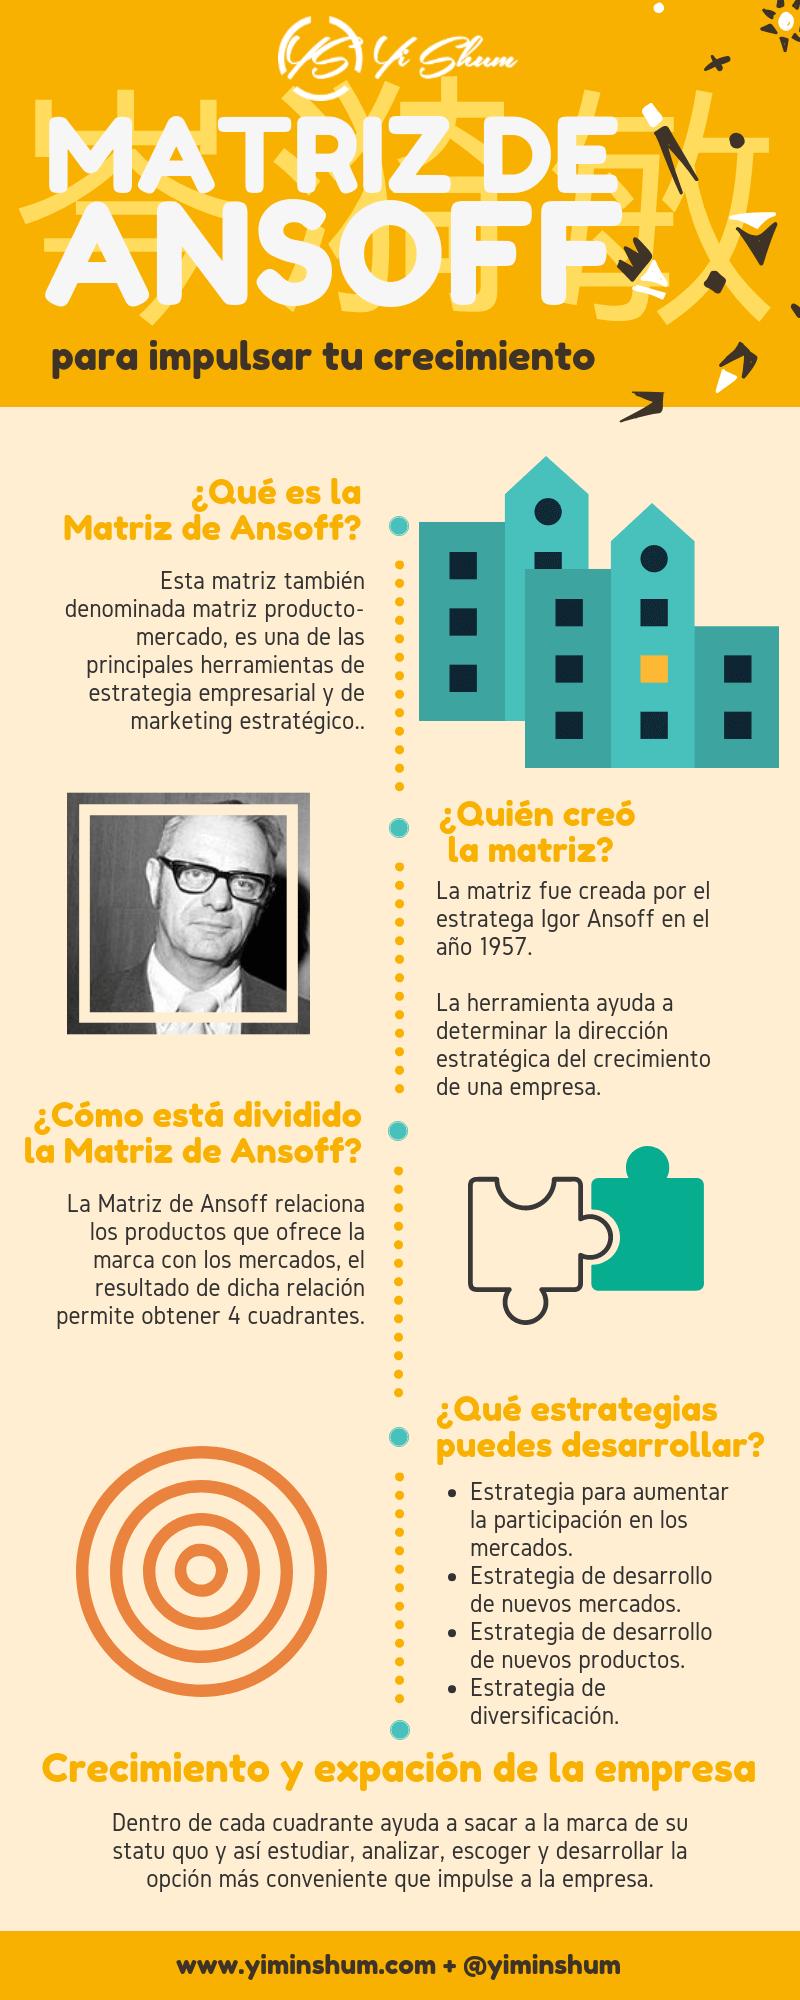 Matriz de Ansoff para impulsar el crecimiento de tu empresa #infografia #infographic